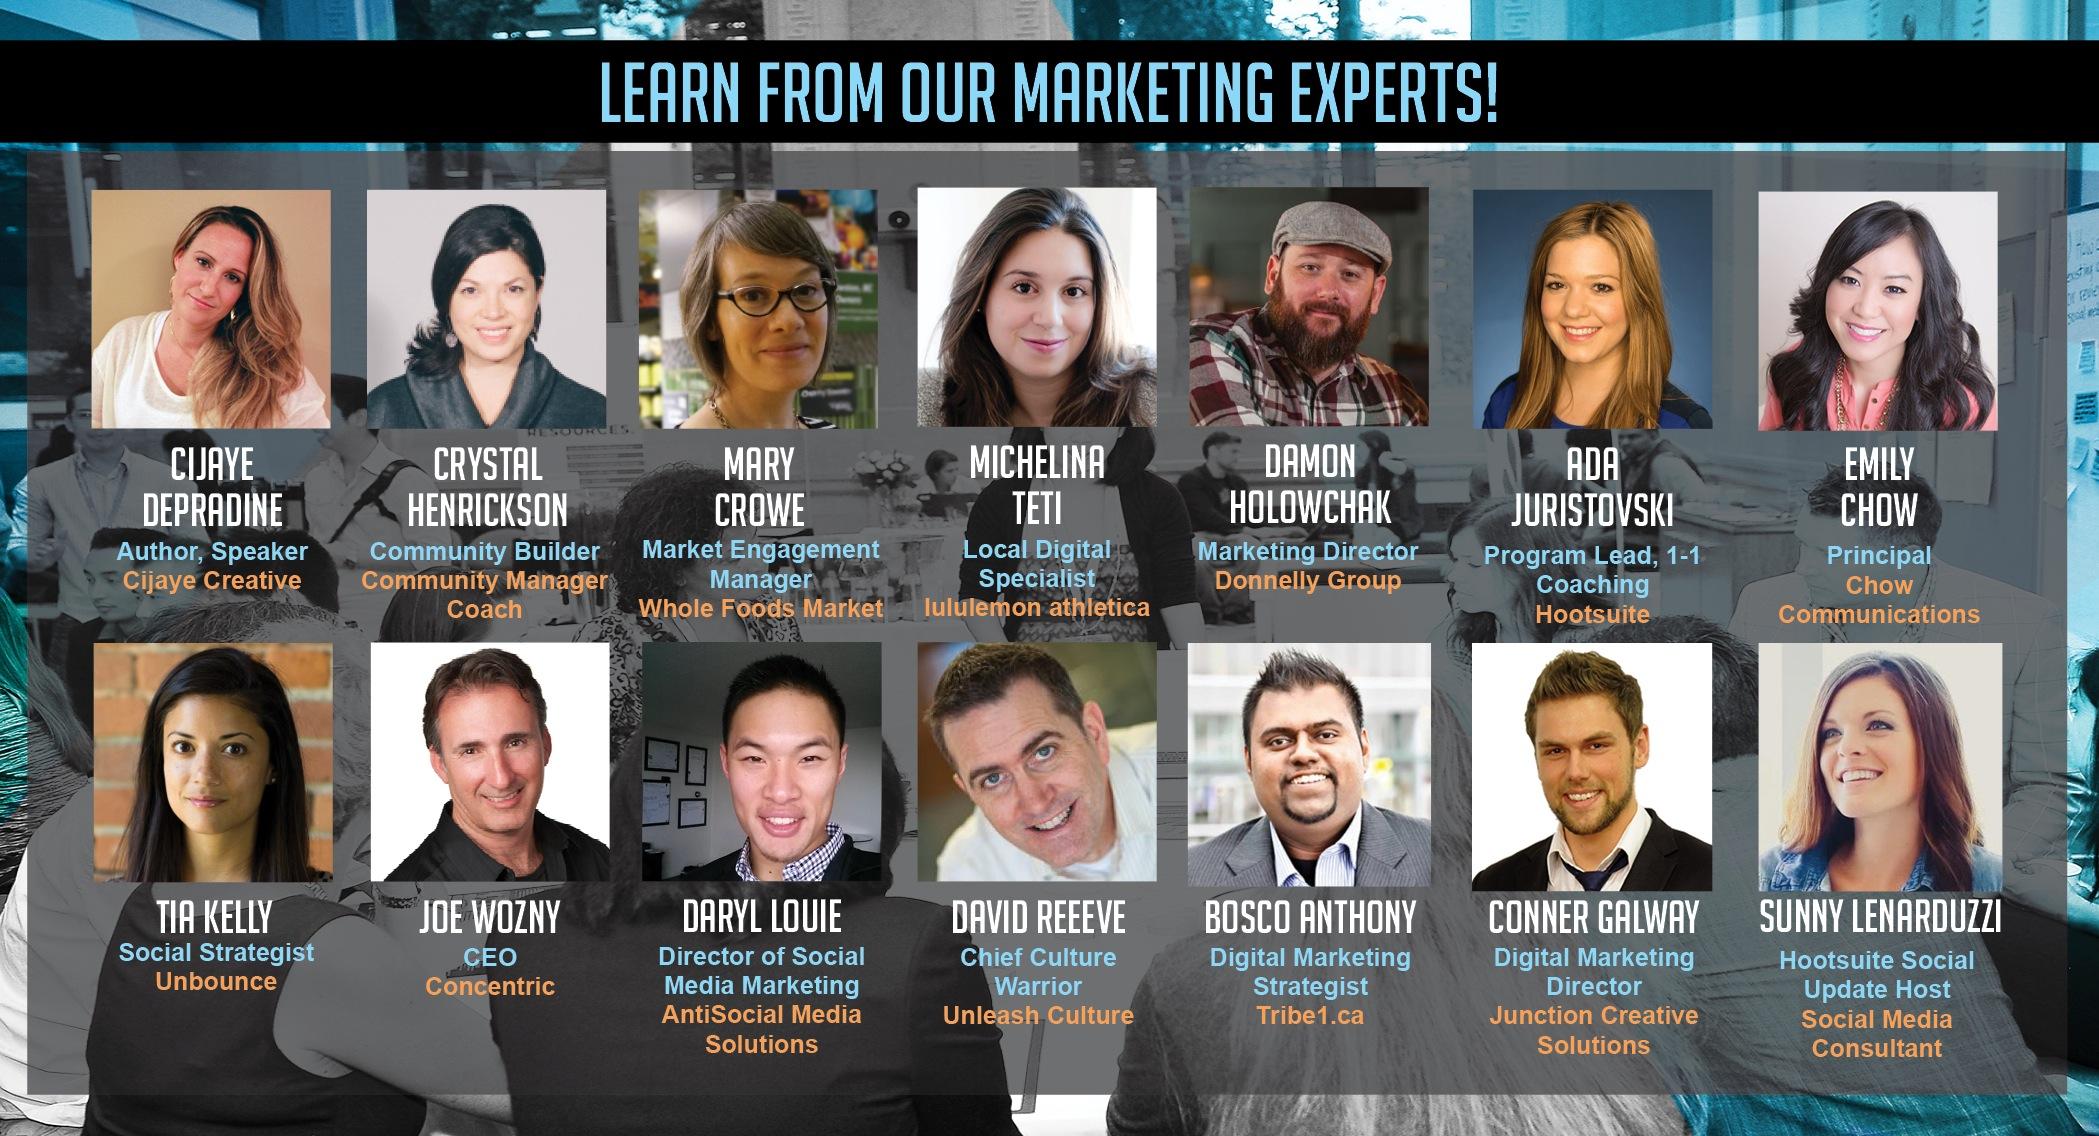 OMG Social Media Conference Speakers 2014